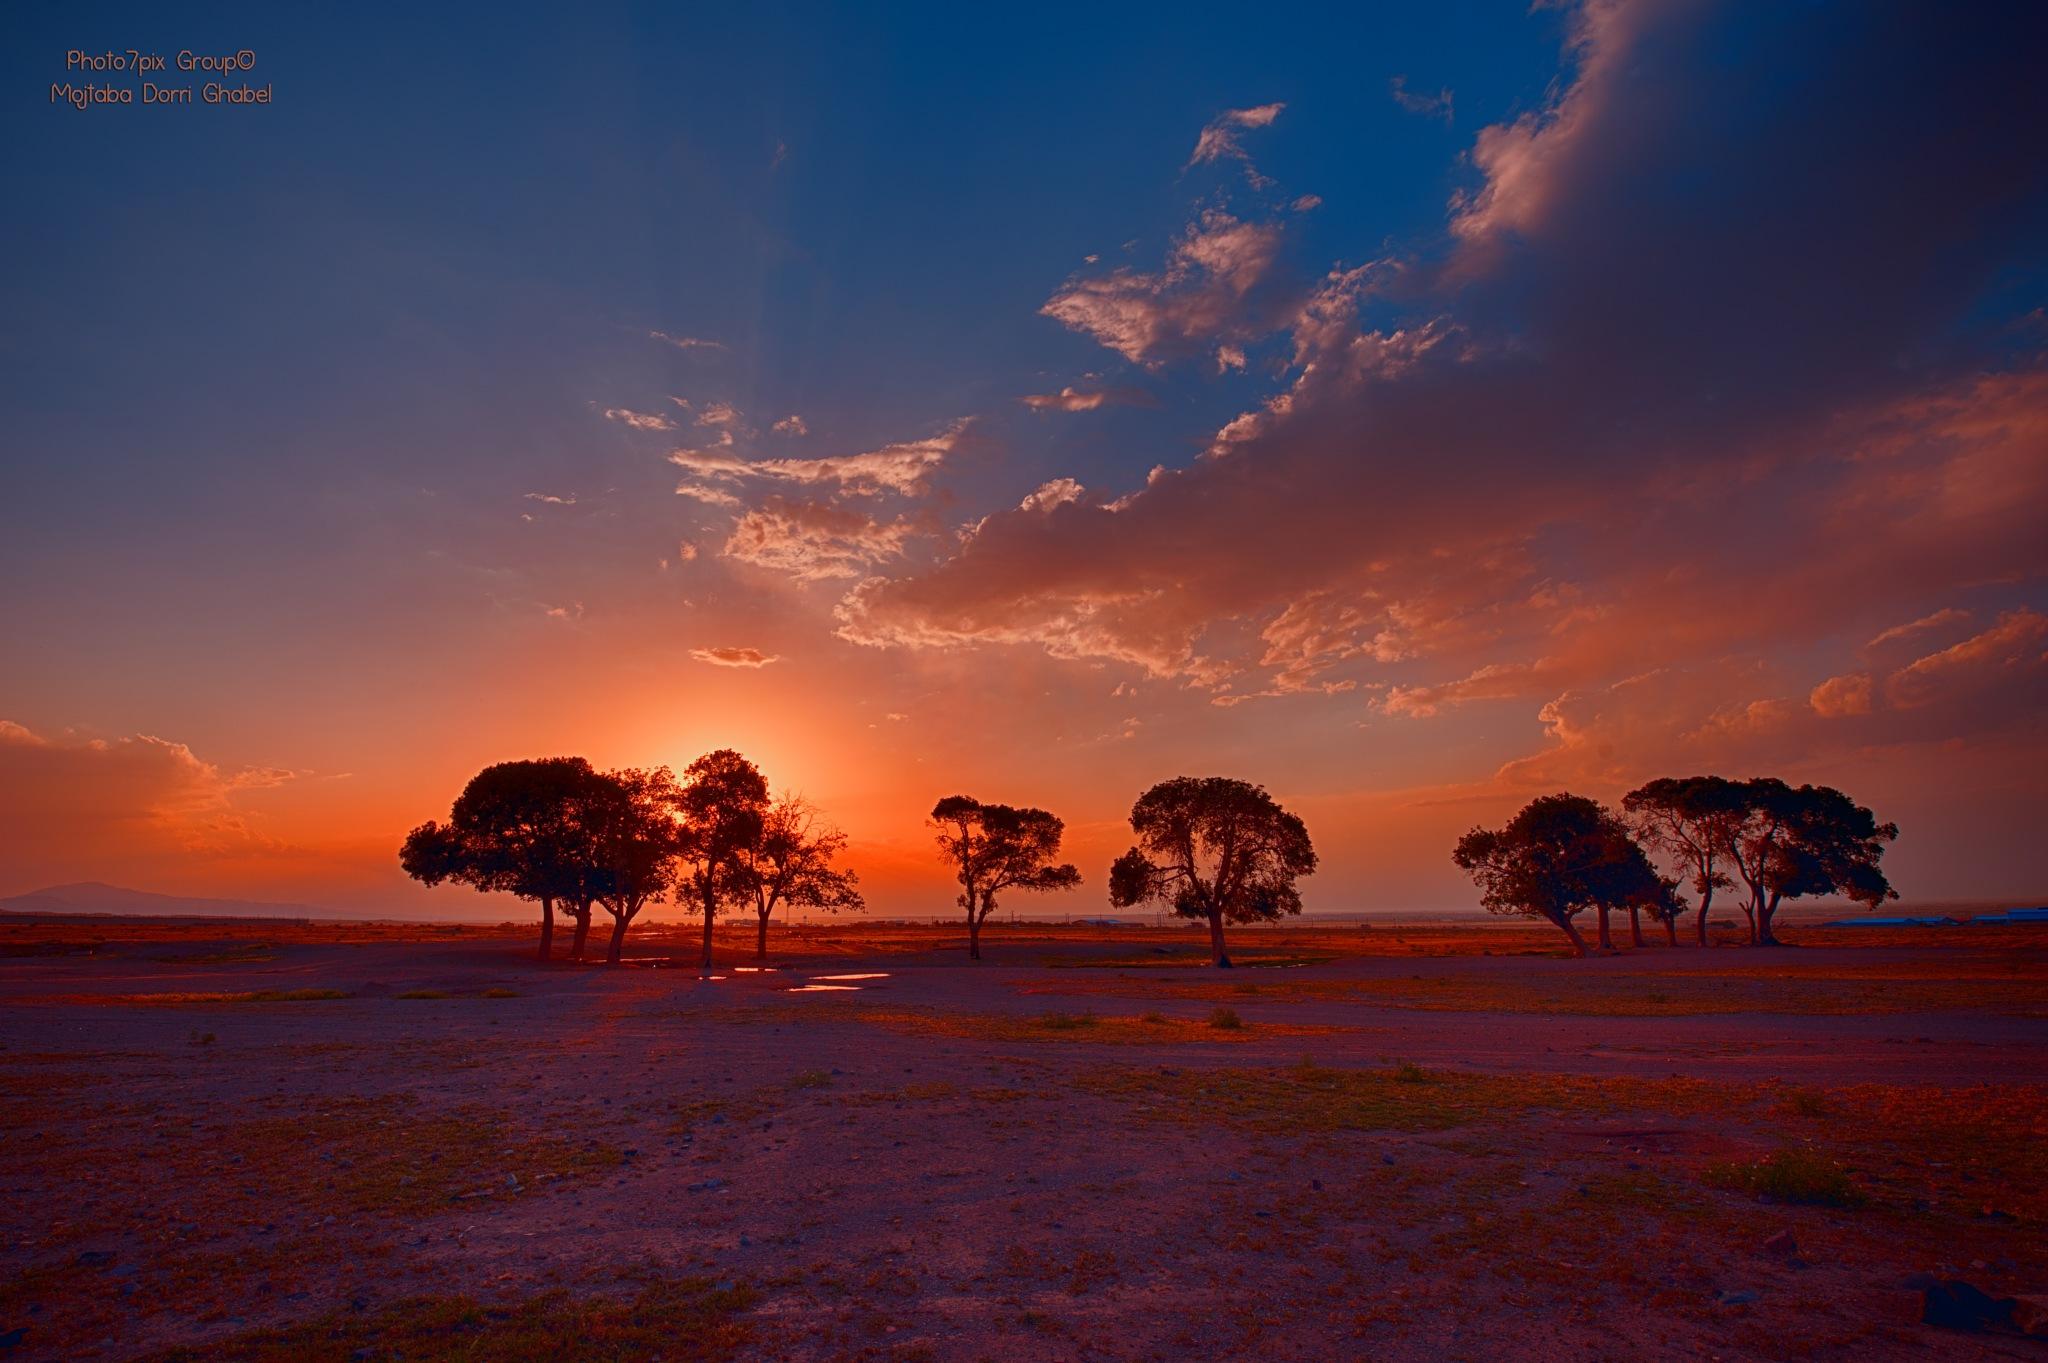 sunset  by mojtabadorri